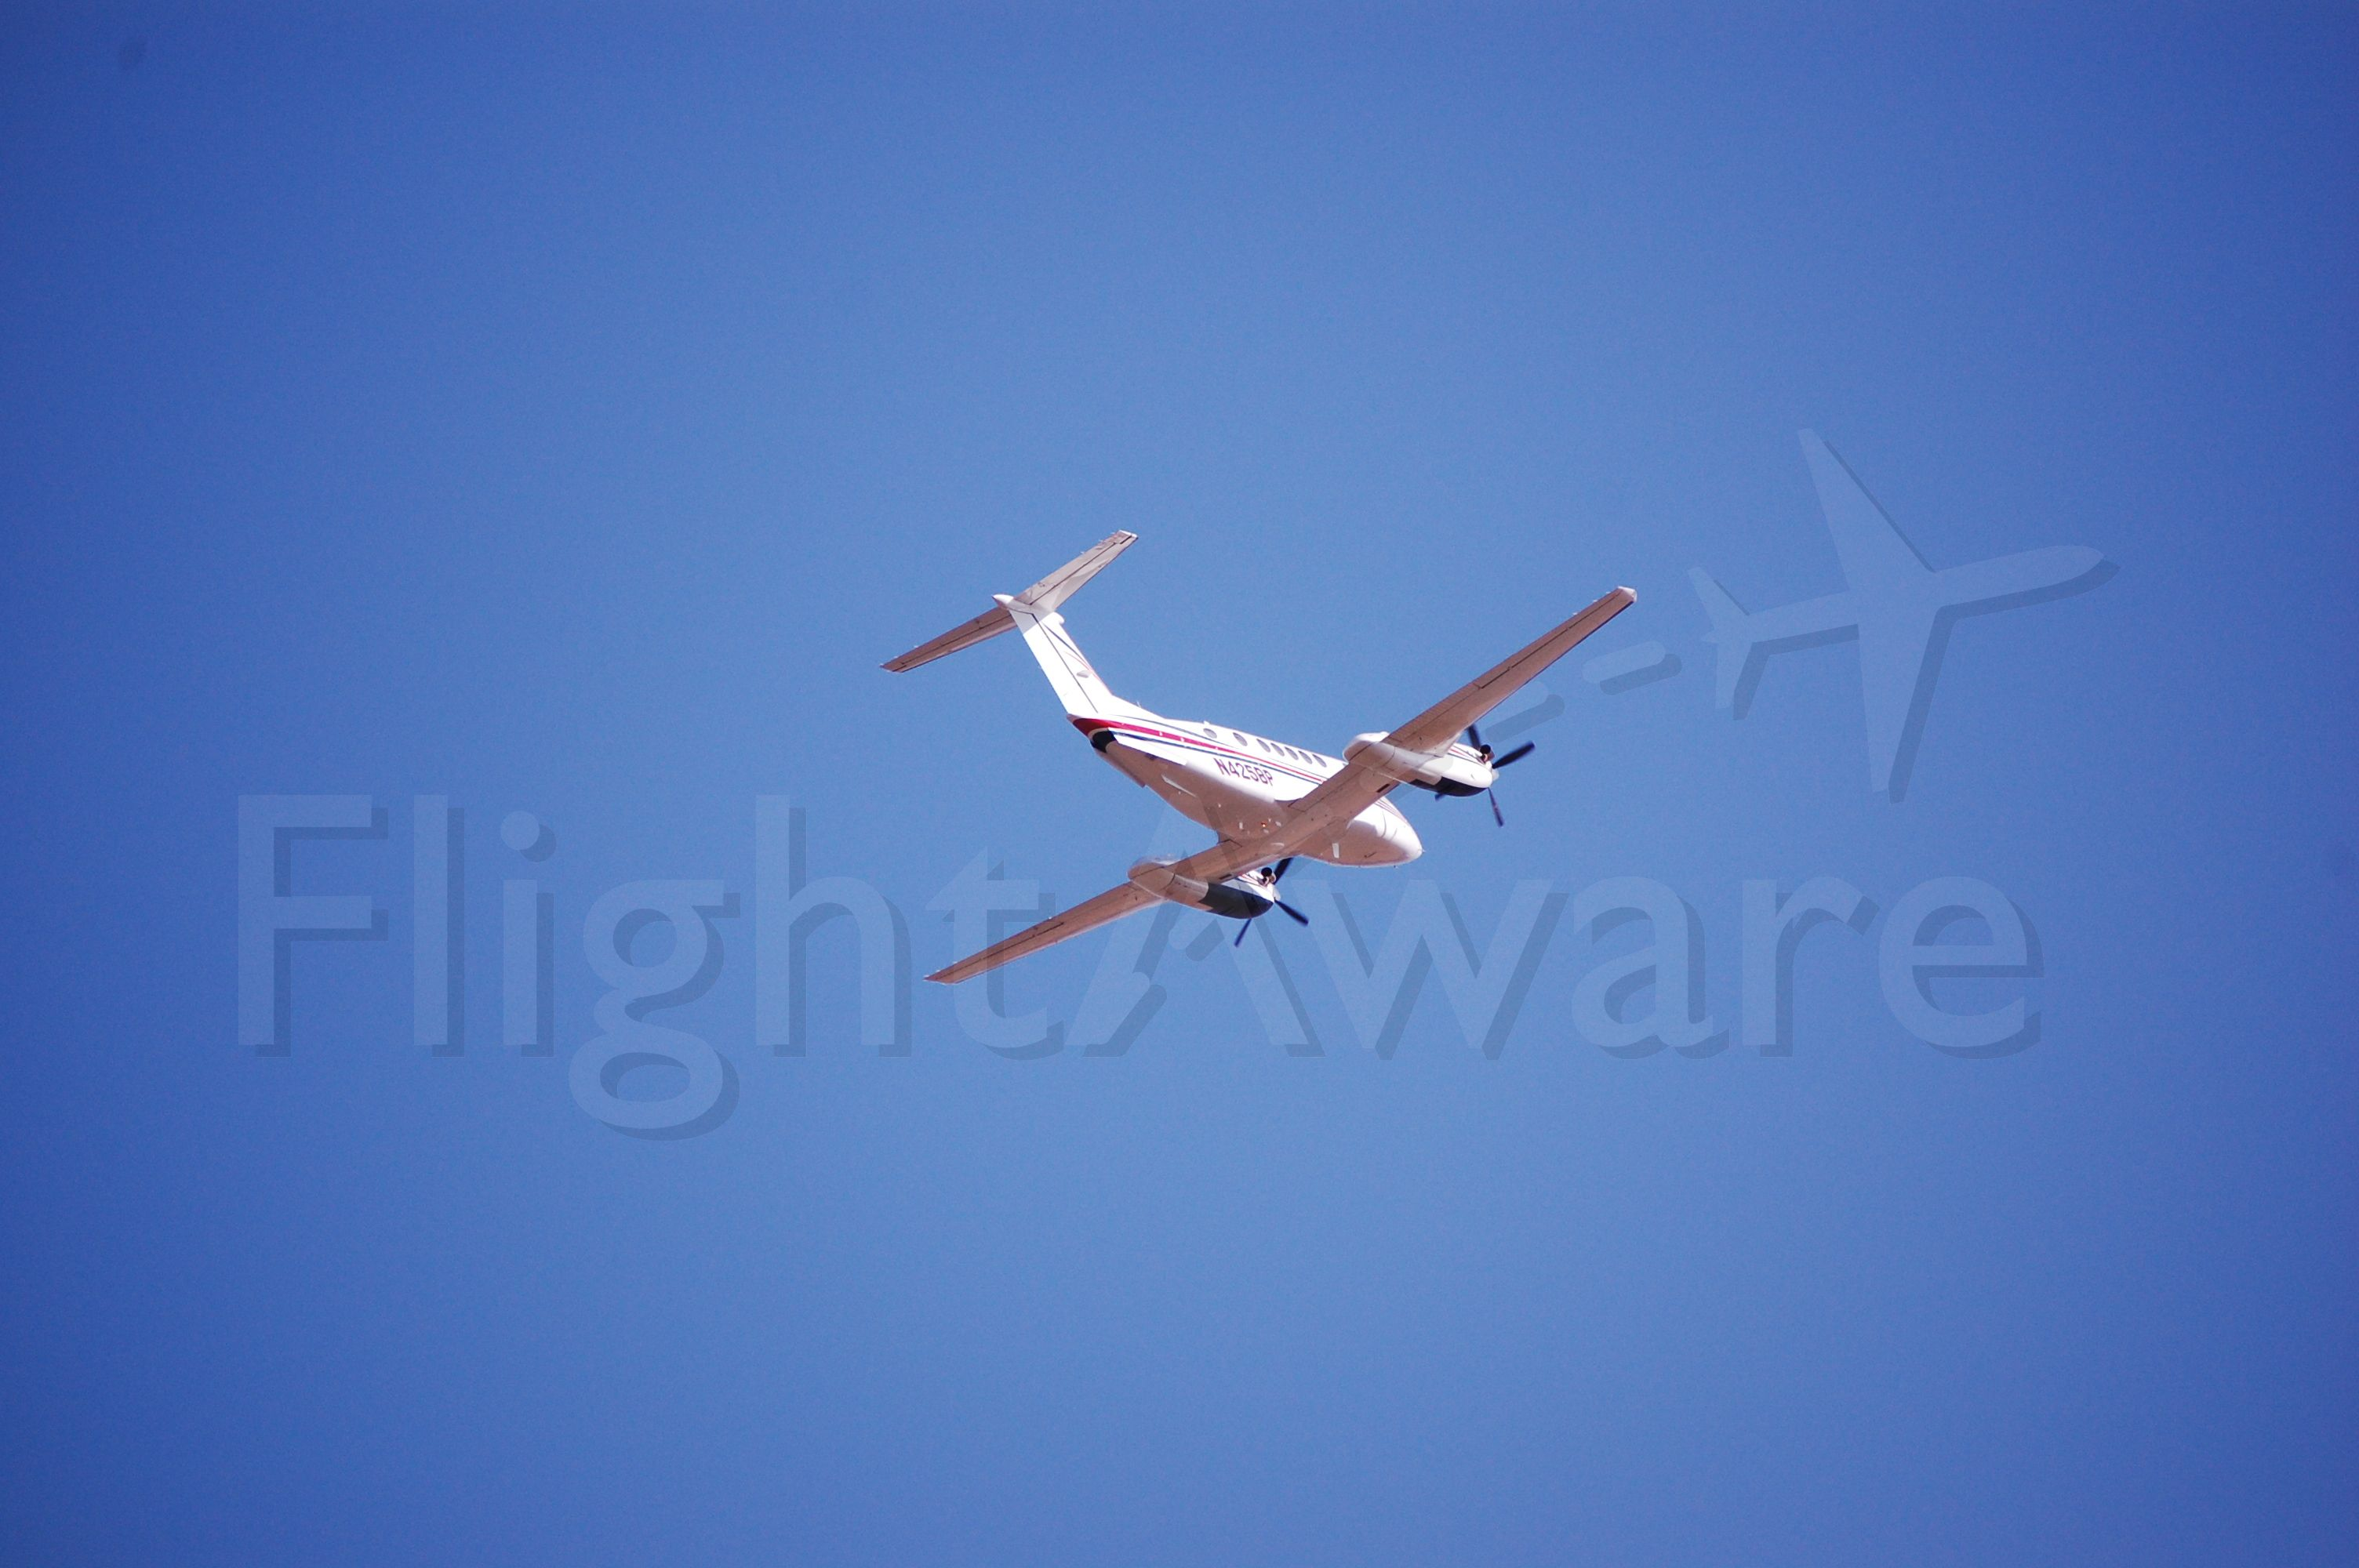 Beechcraft Super King Air 200 (N425BP)